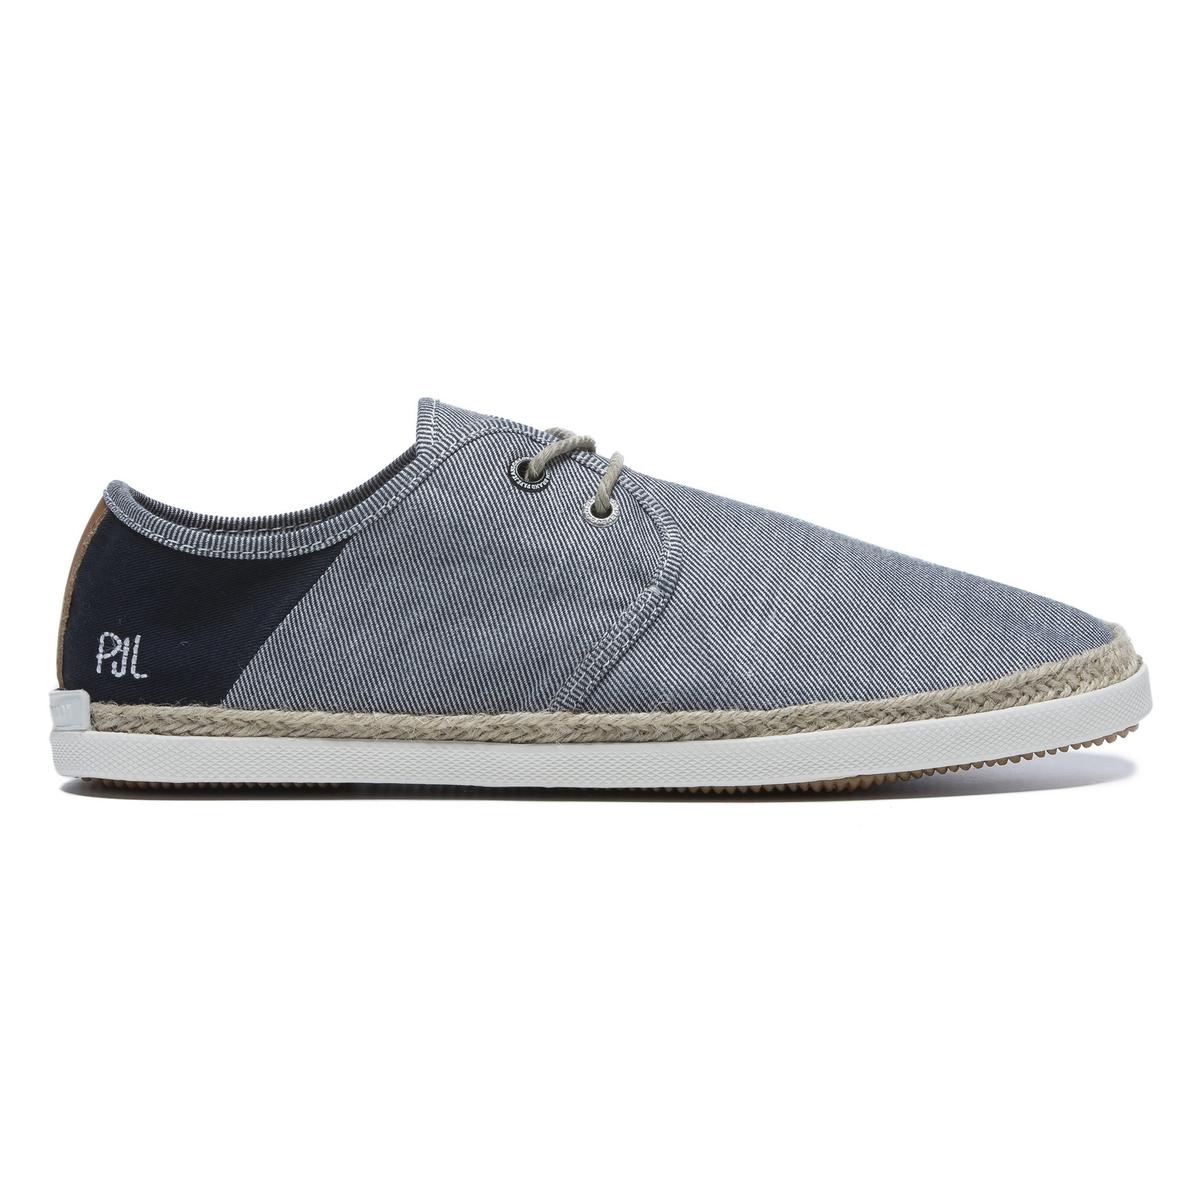 Ботинки-дерби Mauilaces Chambray ботинки дерби под кожу питона